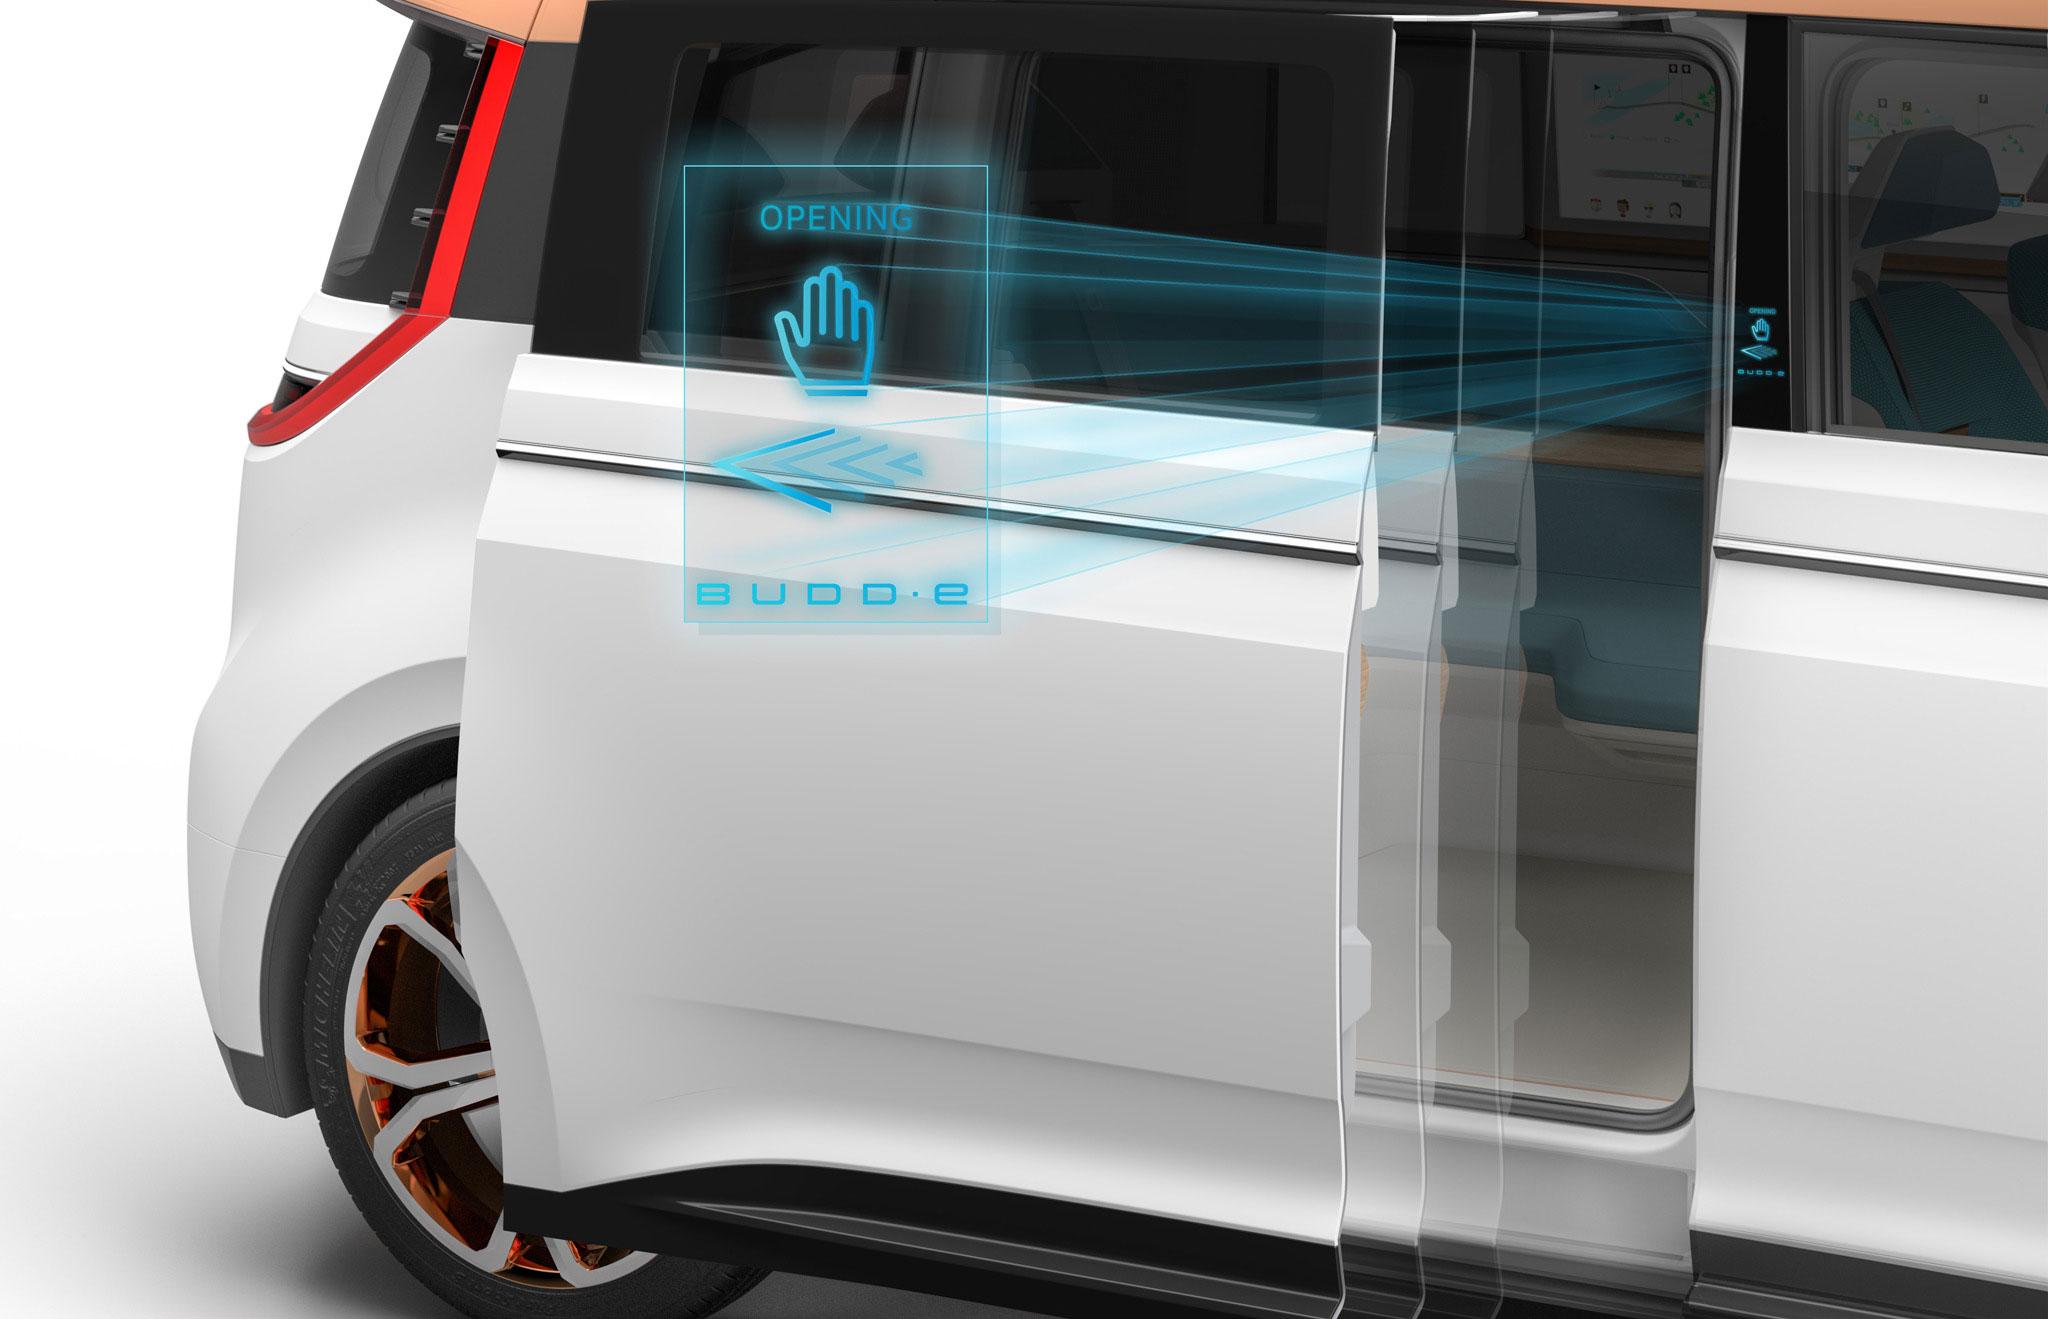 (تصاویر) نسل پیشرفته پلتفرم خودروهای الکتریکی فولکس واگن